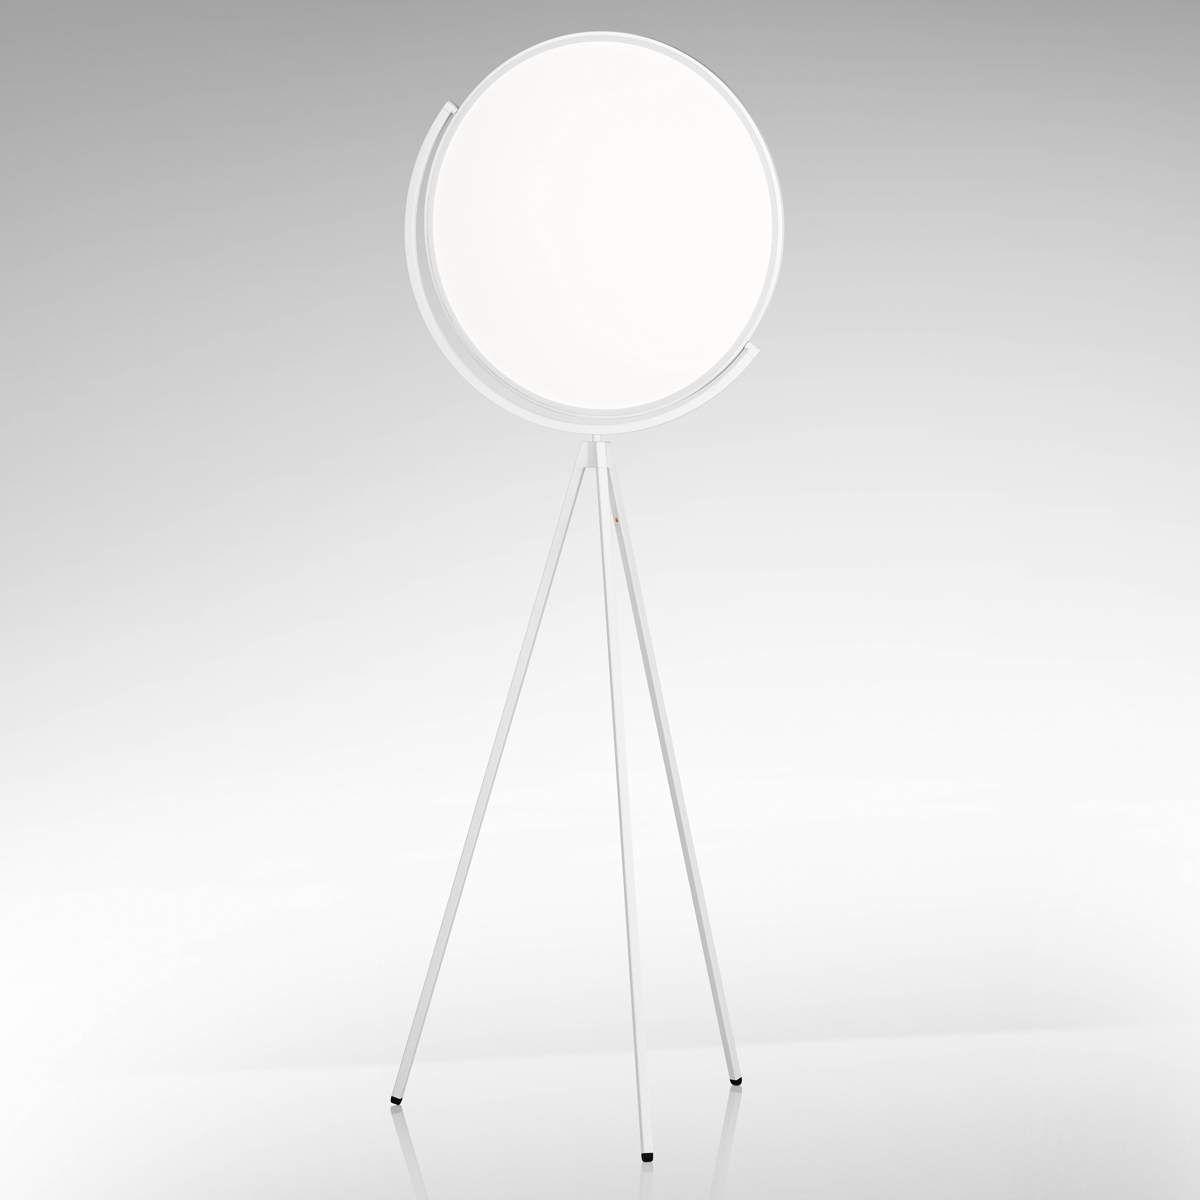 Flos Superloon Weisse Design Stehlampe Mit Led Lampen